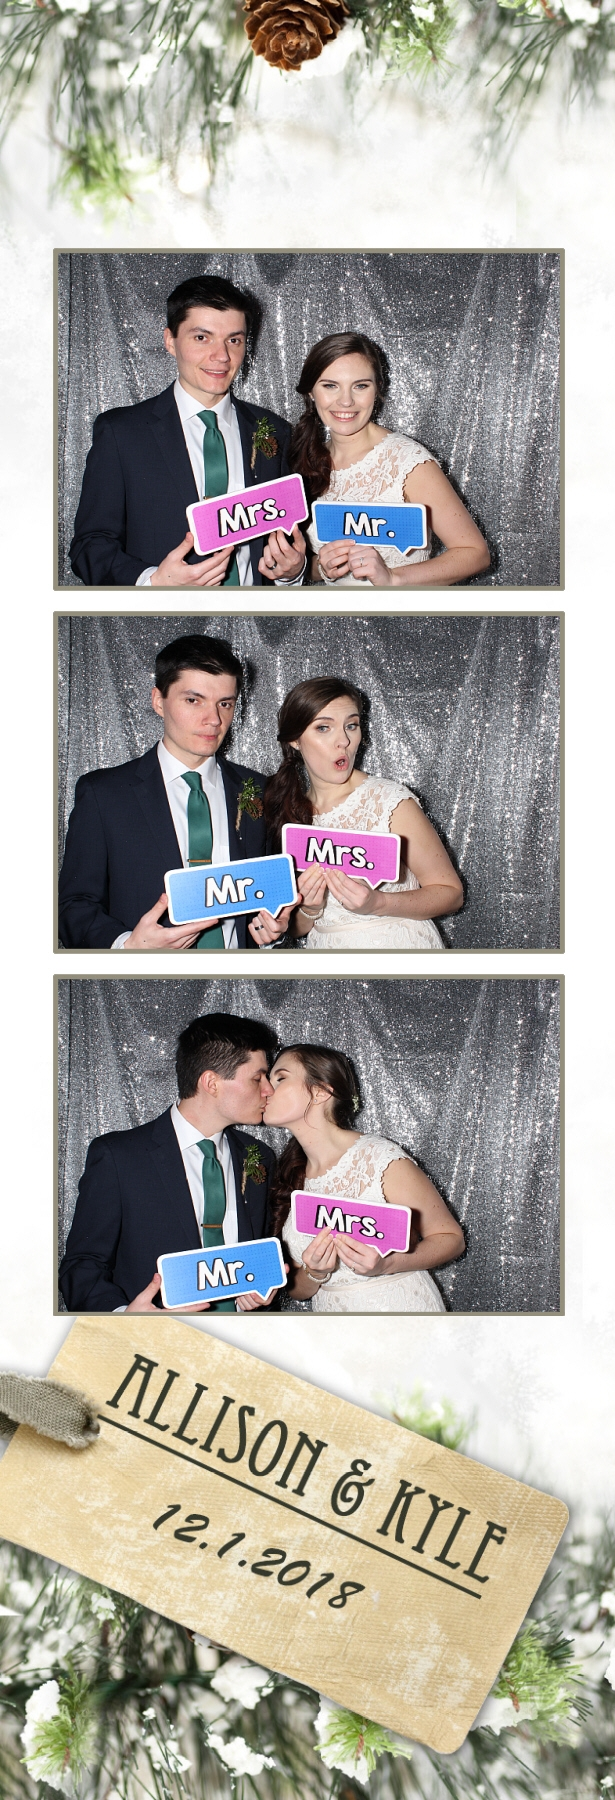 Allison & Kyle